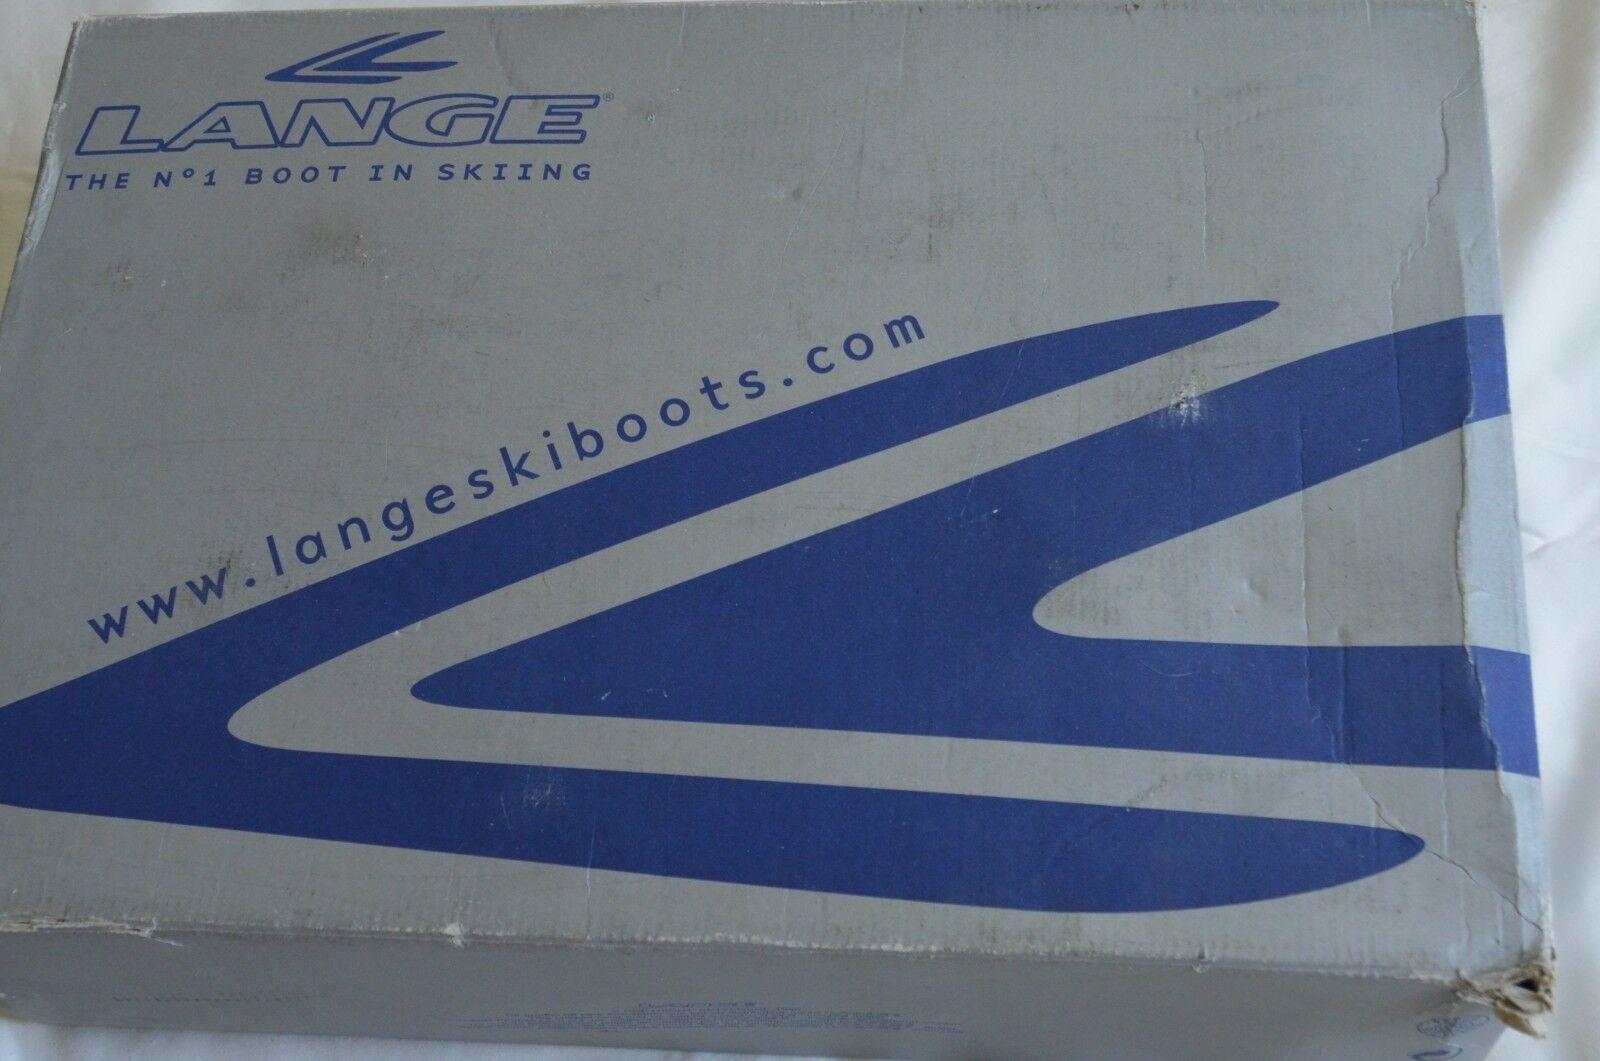 Lange Ski Stiefel 70 VEC-S Blau Pacific, Unisex Größe 10,5 damen, 9,5- men